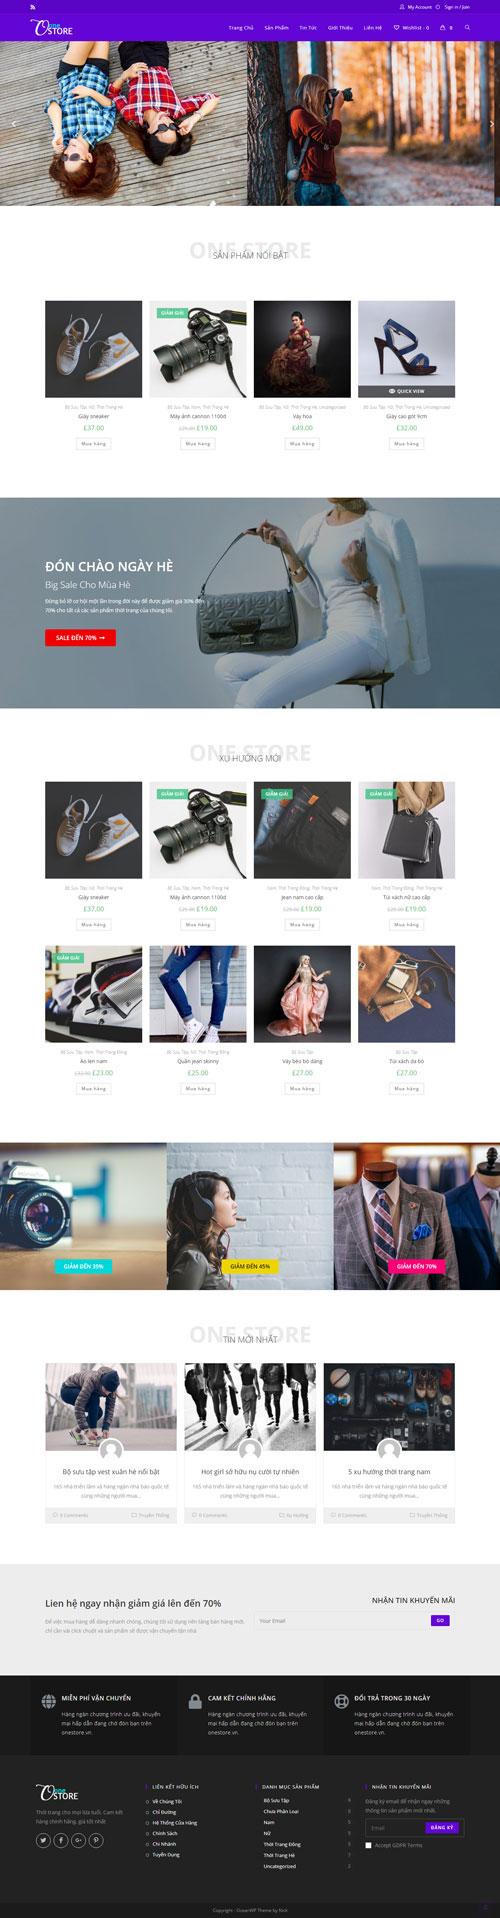 Website thời trang One Store 1